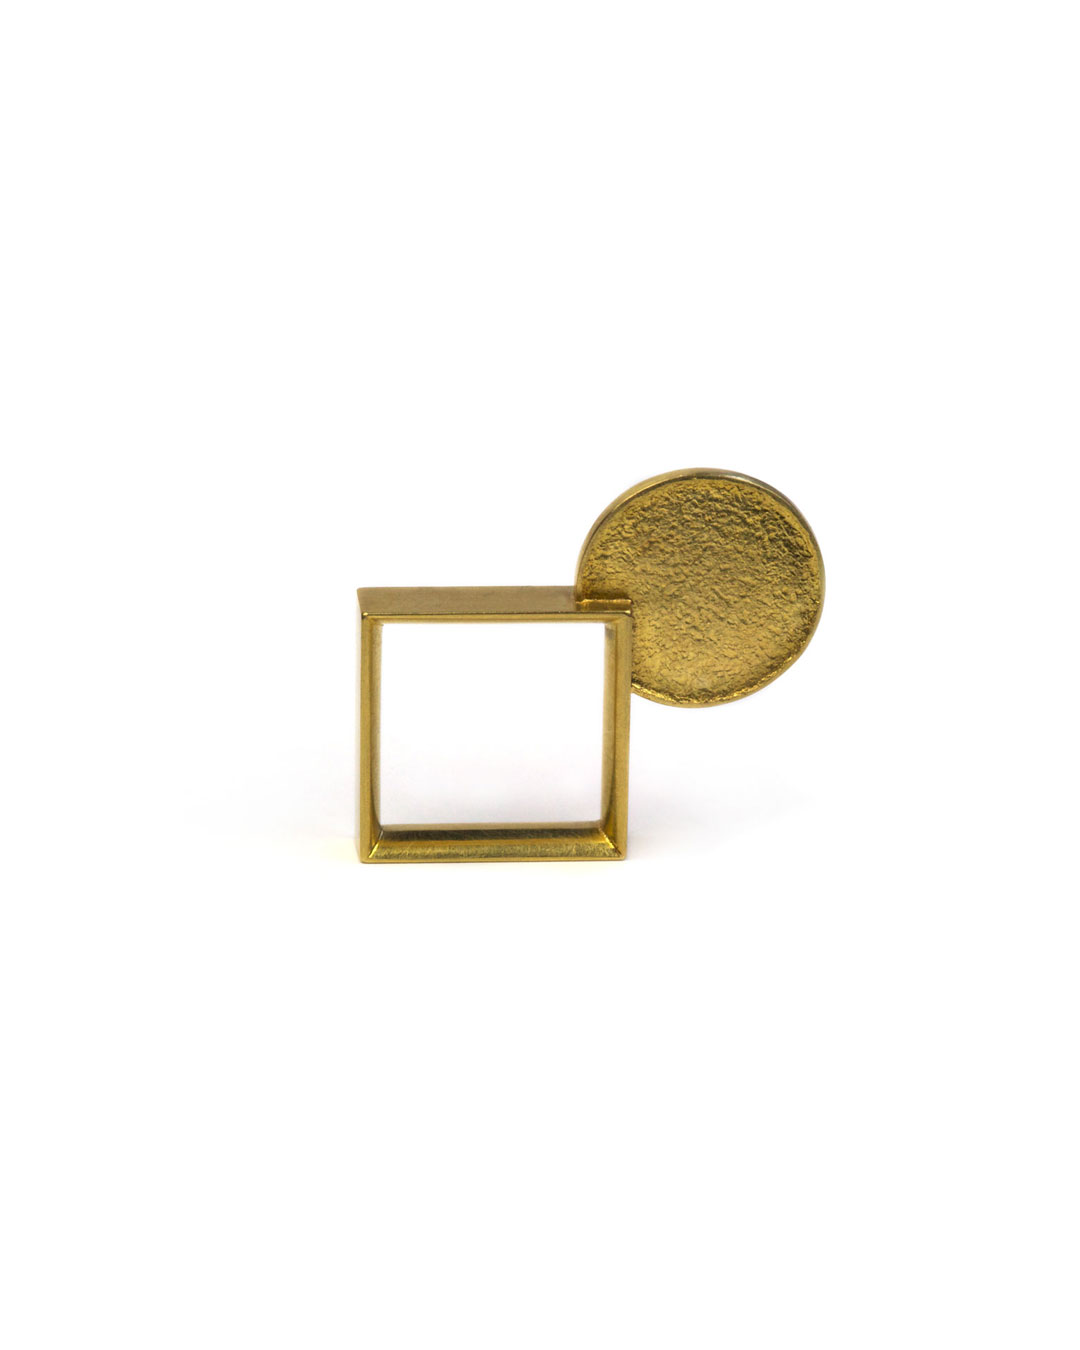 Okinari Kurokawa, untitled, 1996, ring; 18ct gold, 31 x 28 x 5 mm